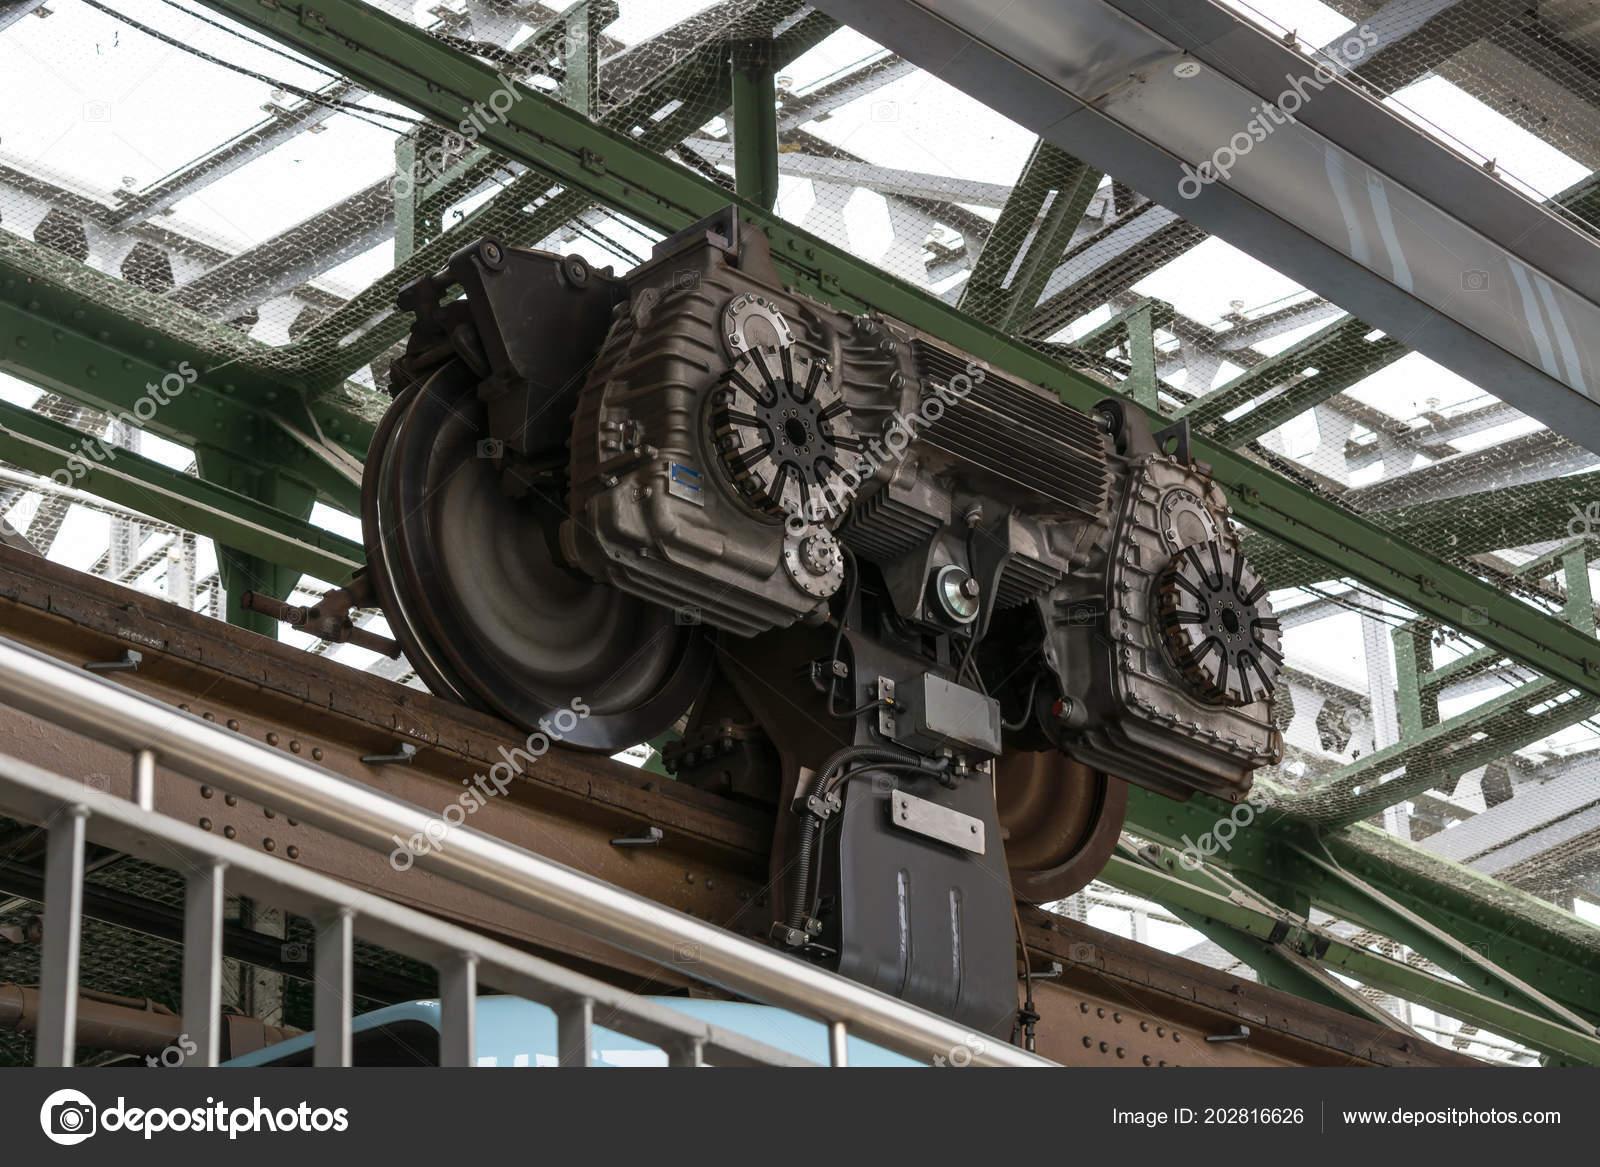 Station motor ophanging railway wuppertal duitsland u2014 stockfoto